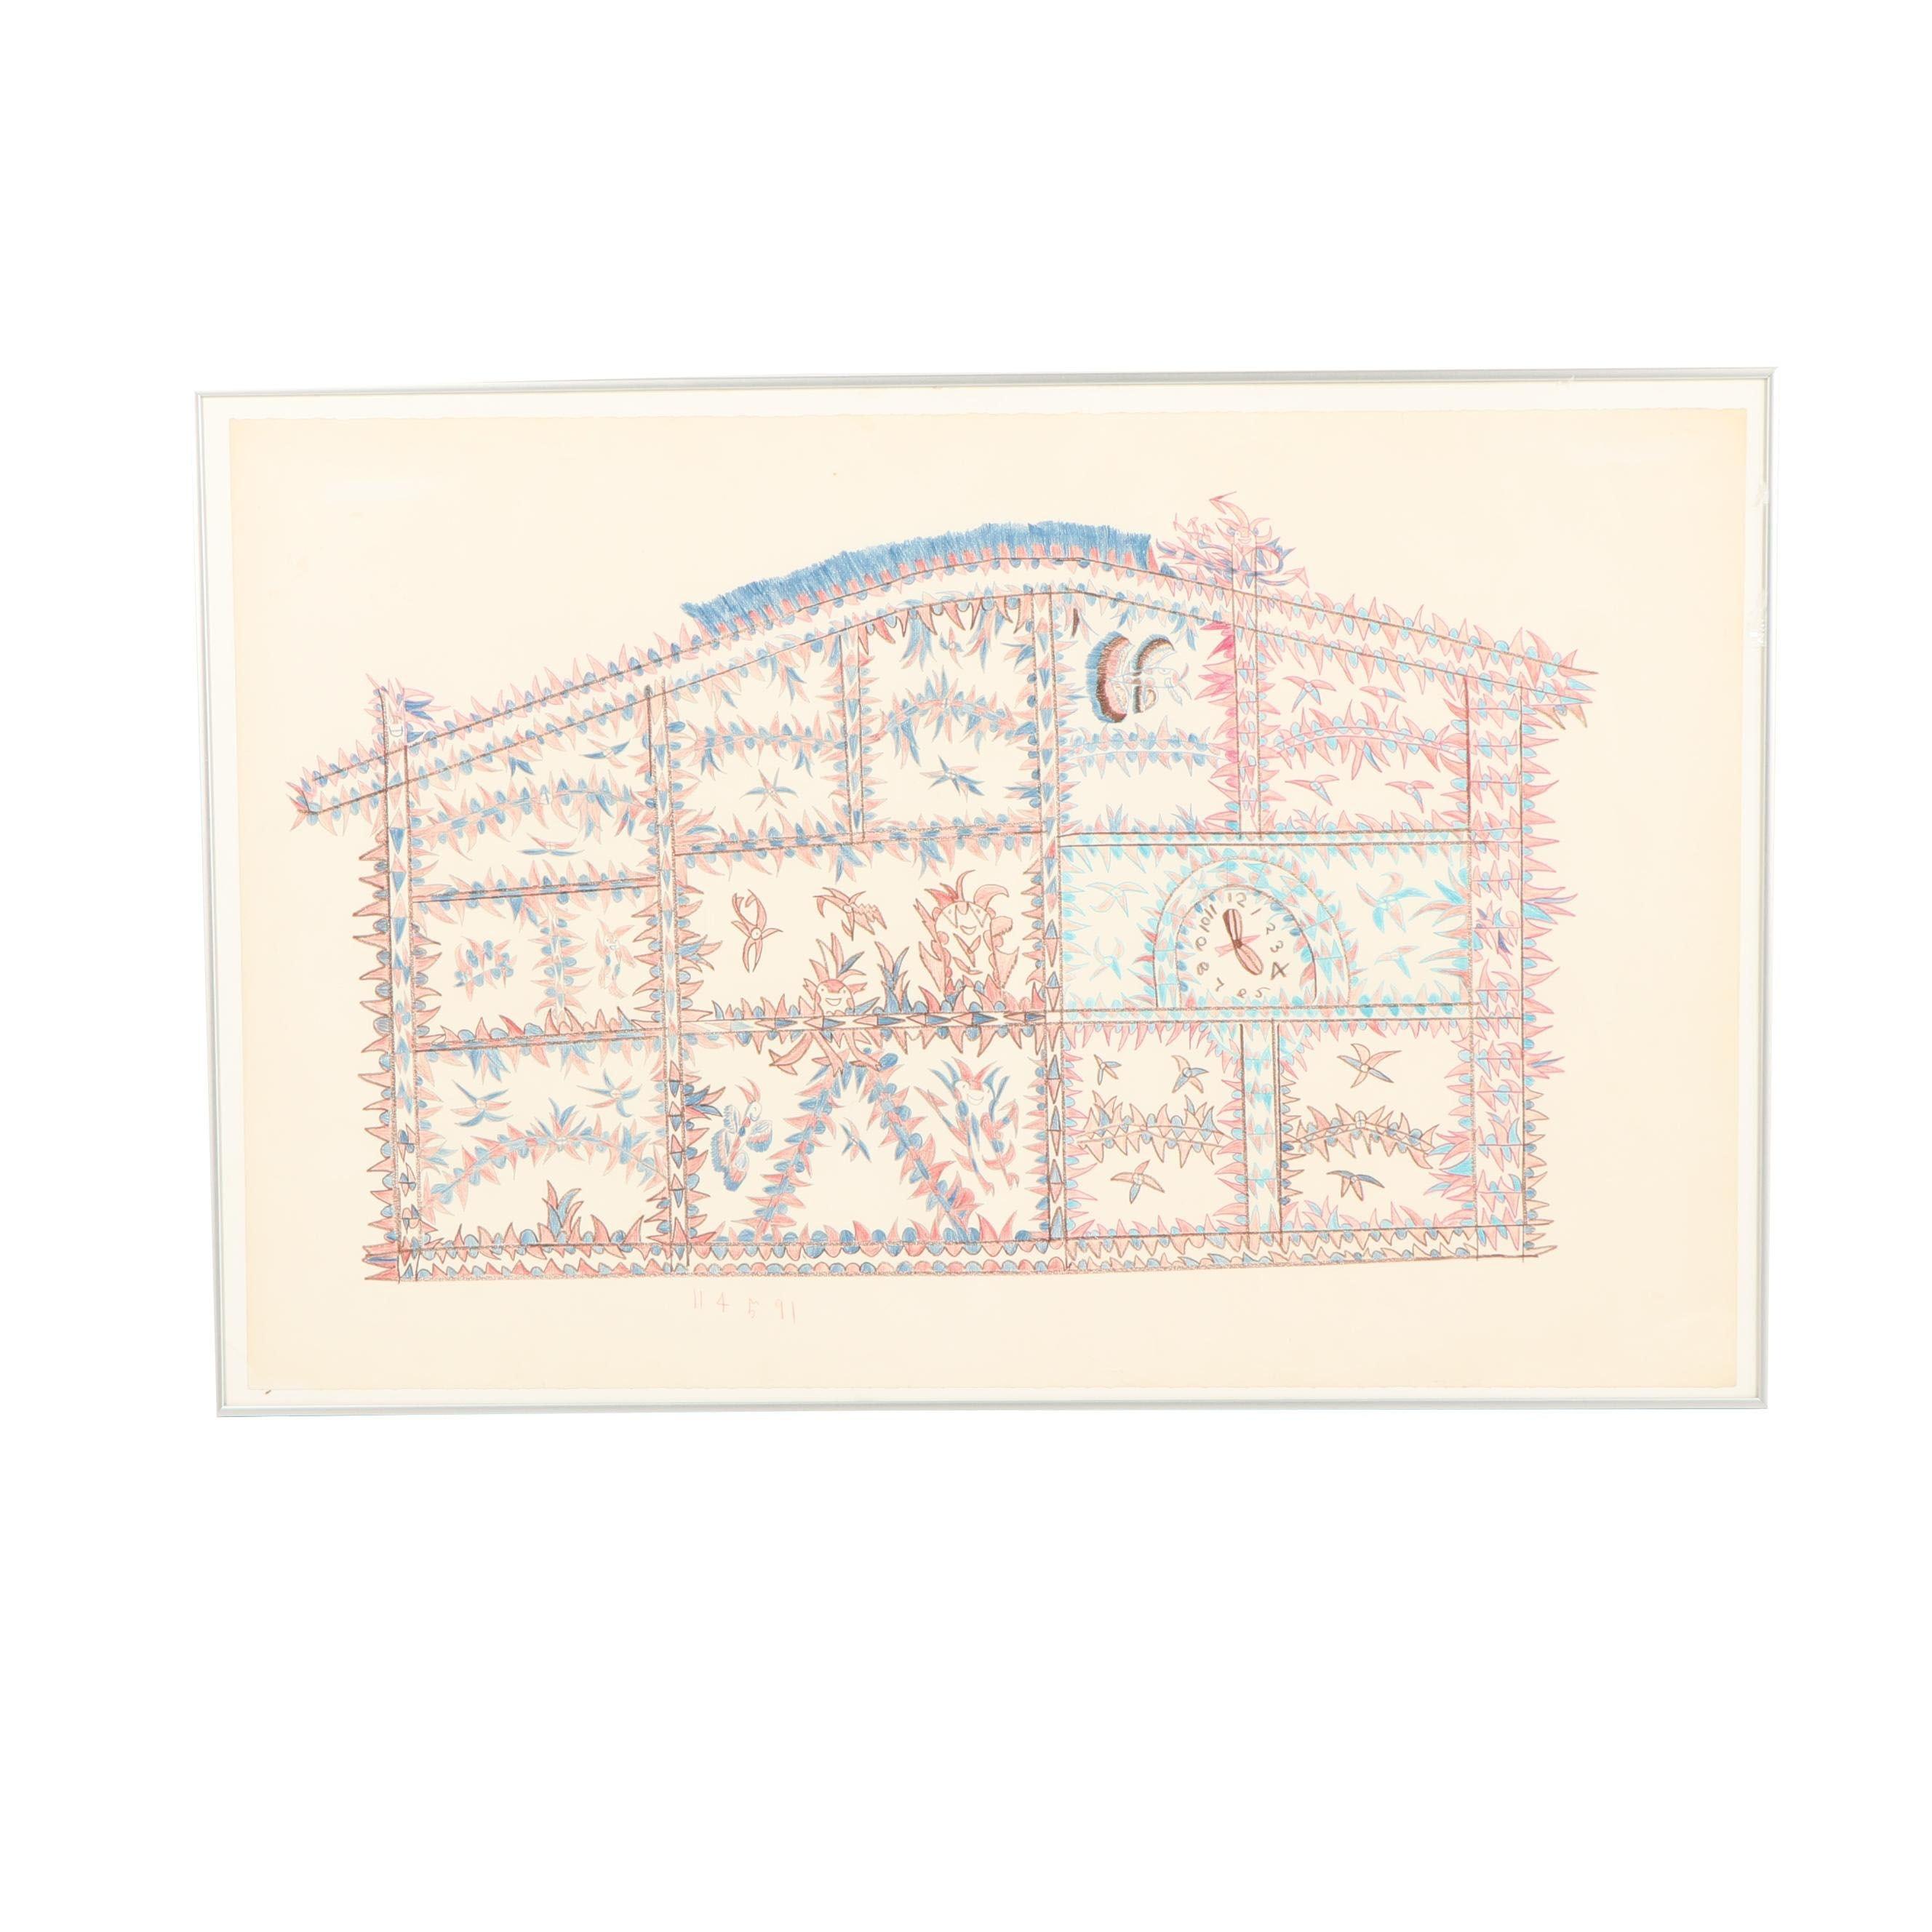 "Frank Jones Naïve Colored Pencil Drawing ""Bad Millionaire House"""